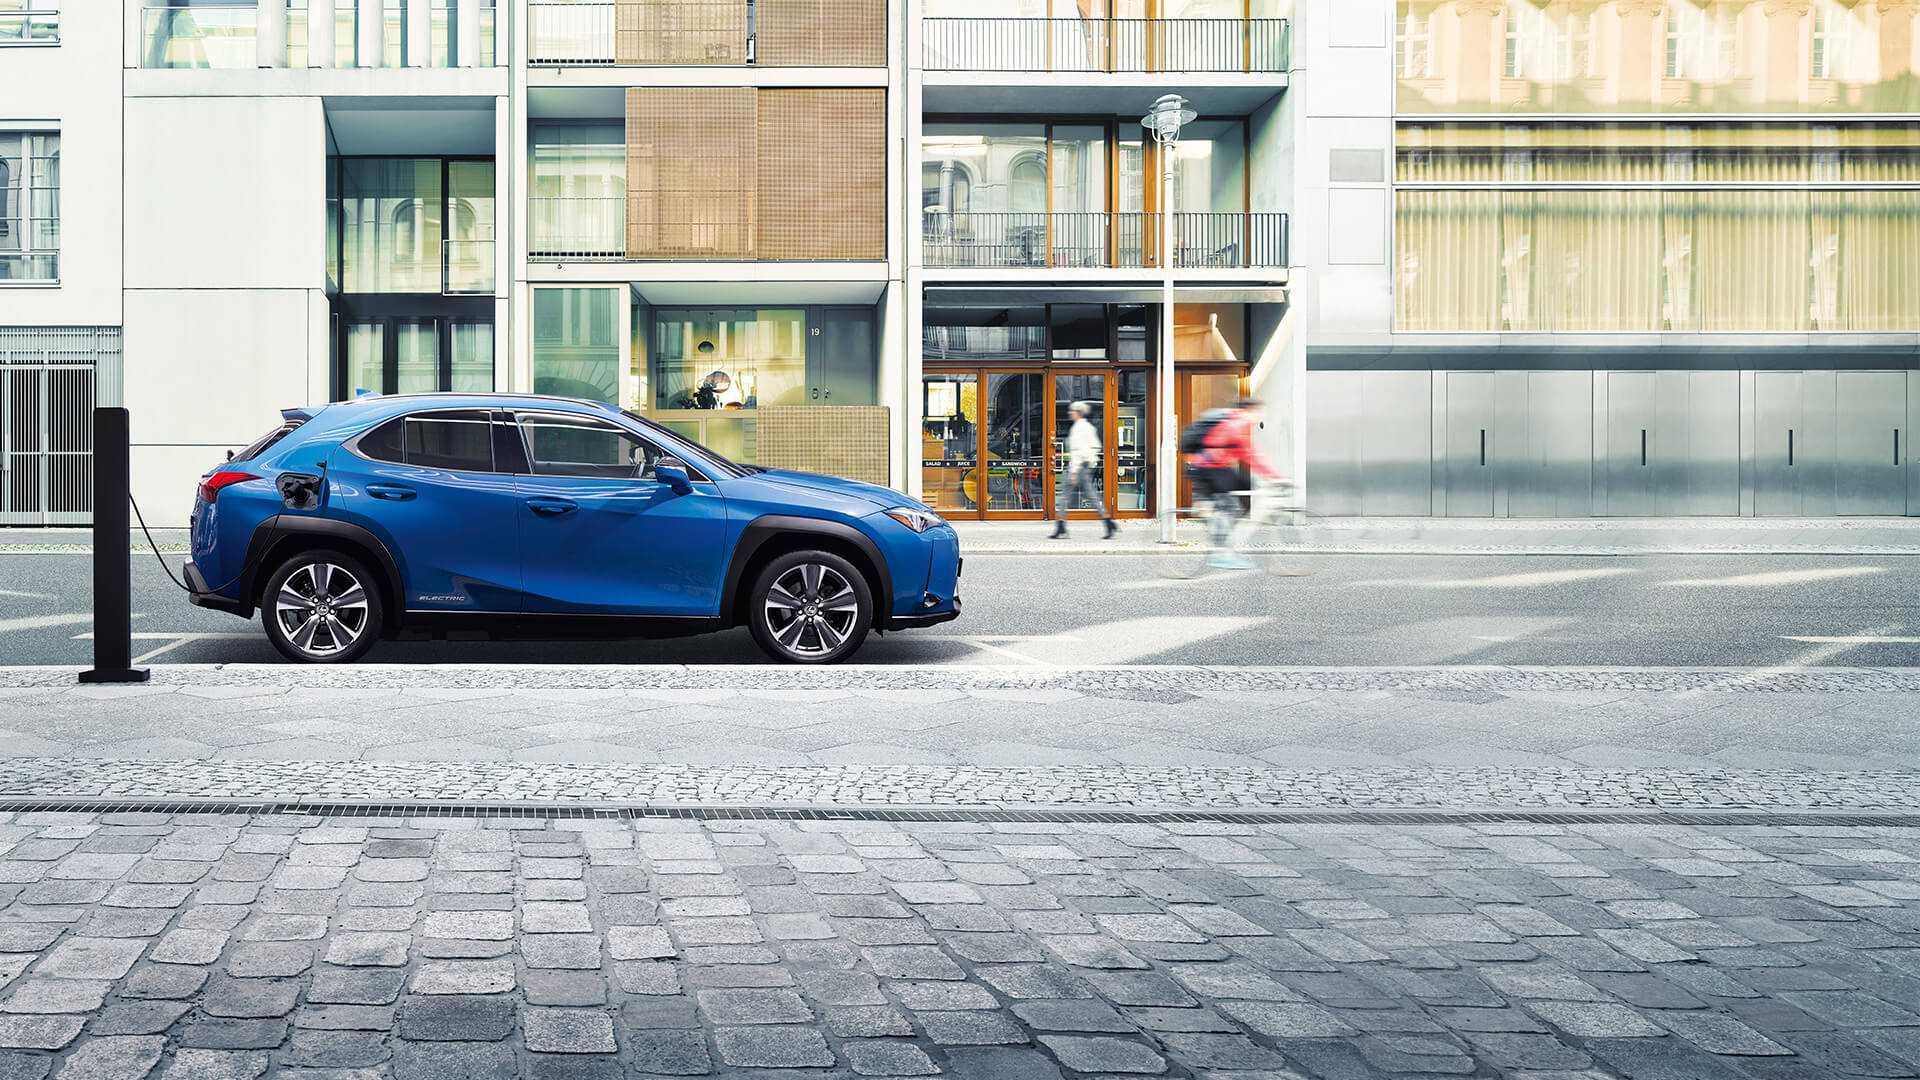 Lexus ux 300e— презентация электромобиля с запасом хода 400 км